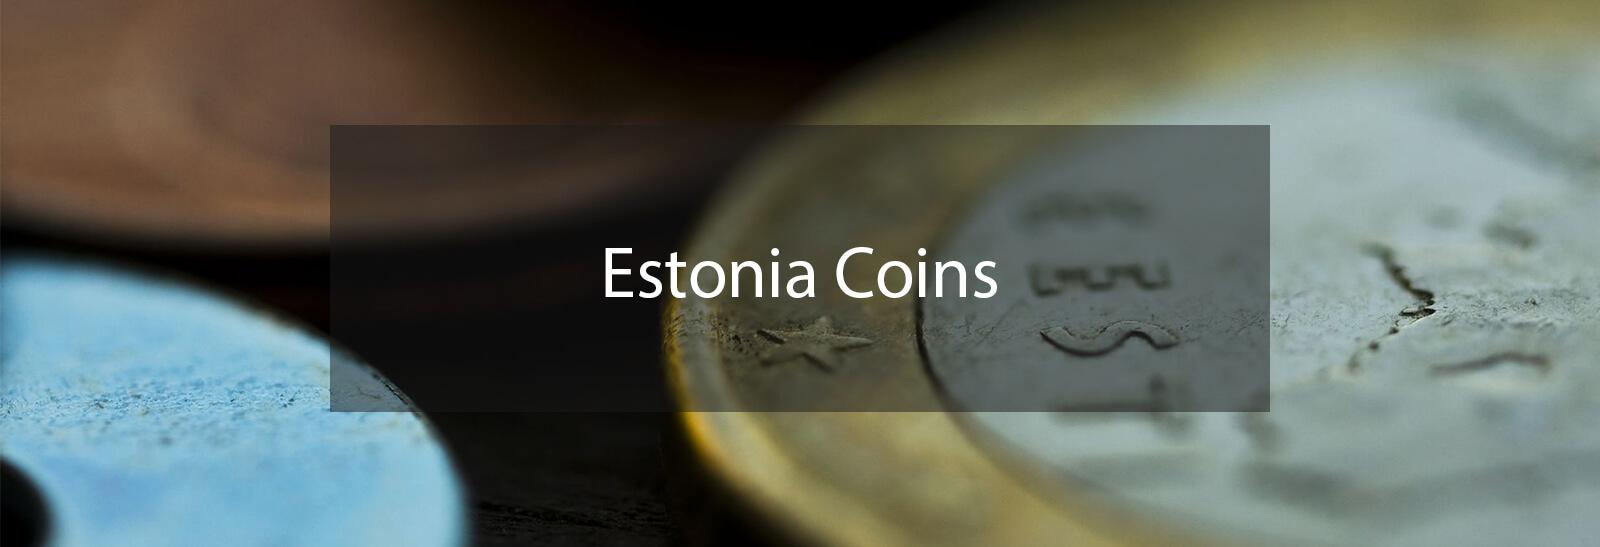 Estonia coins